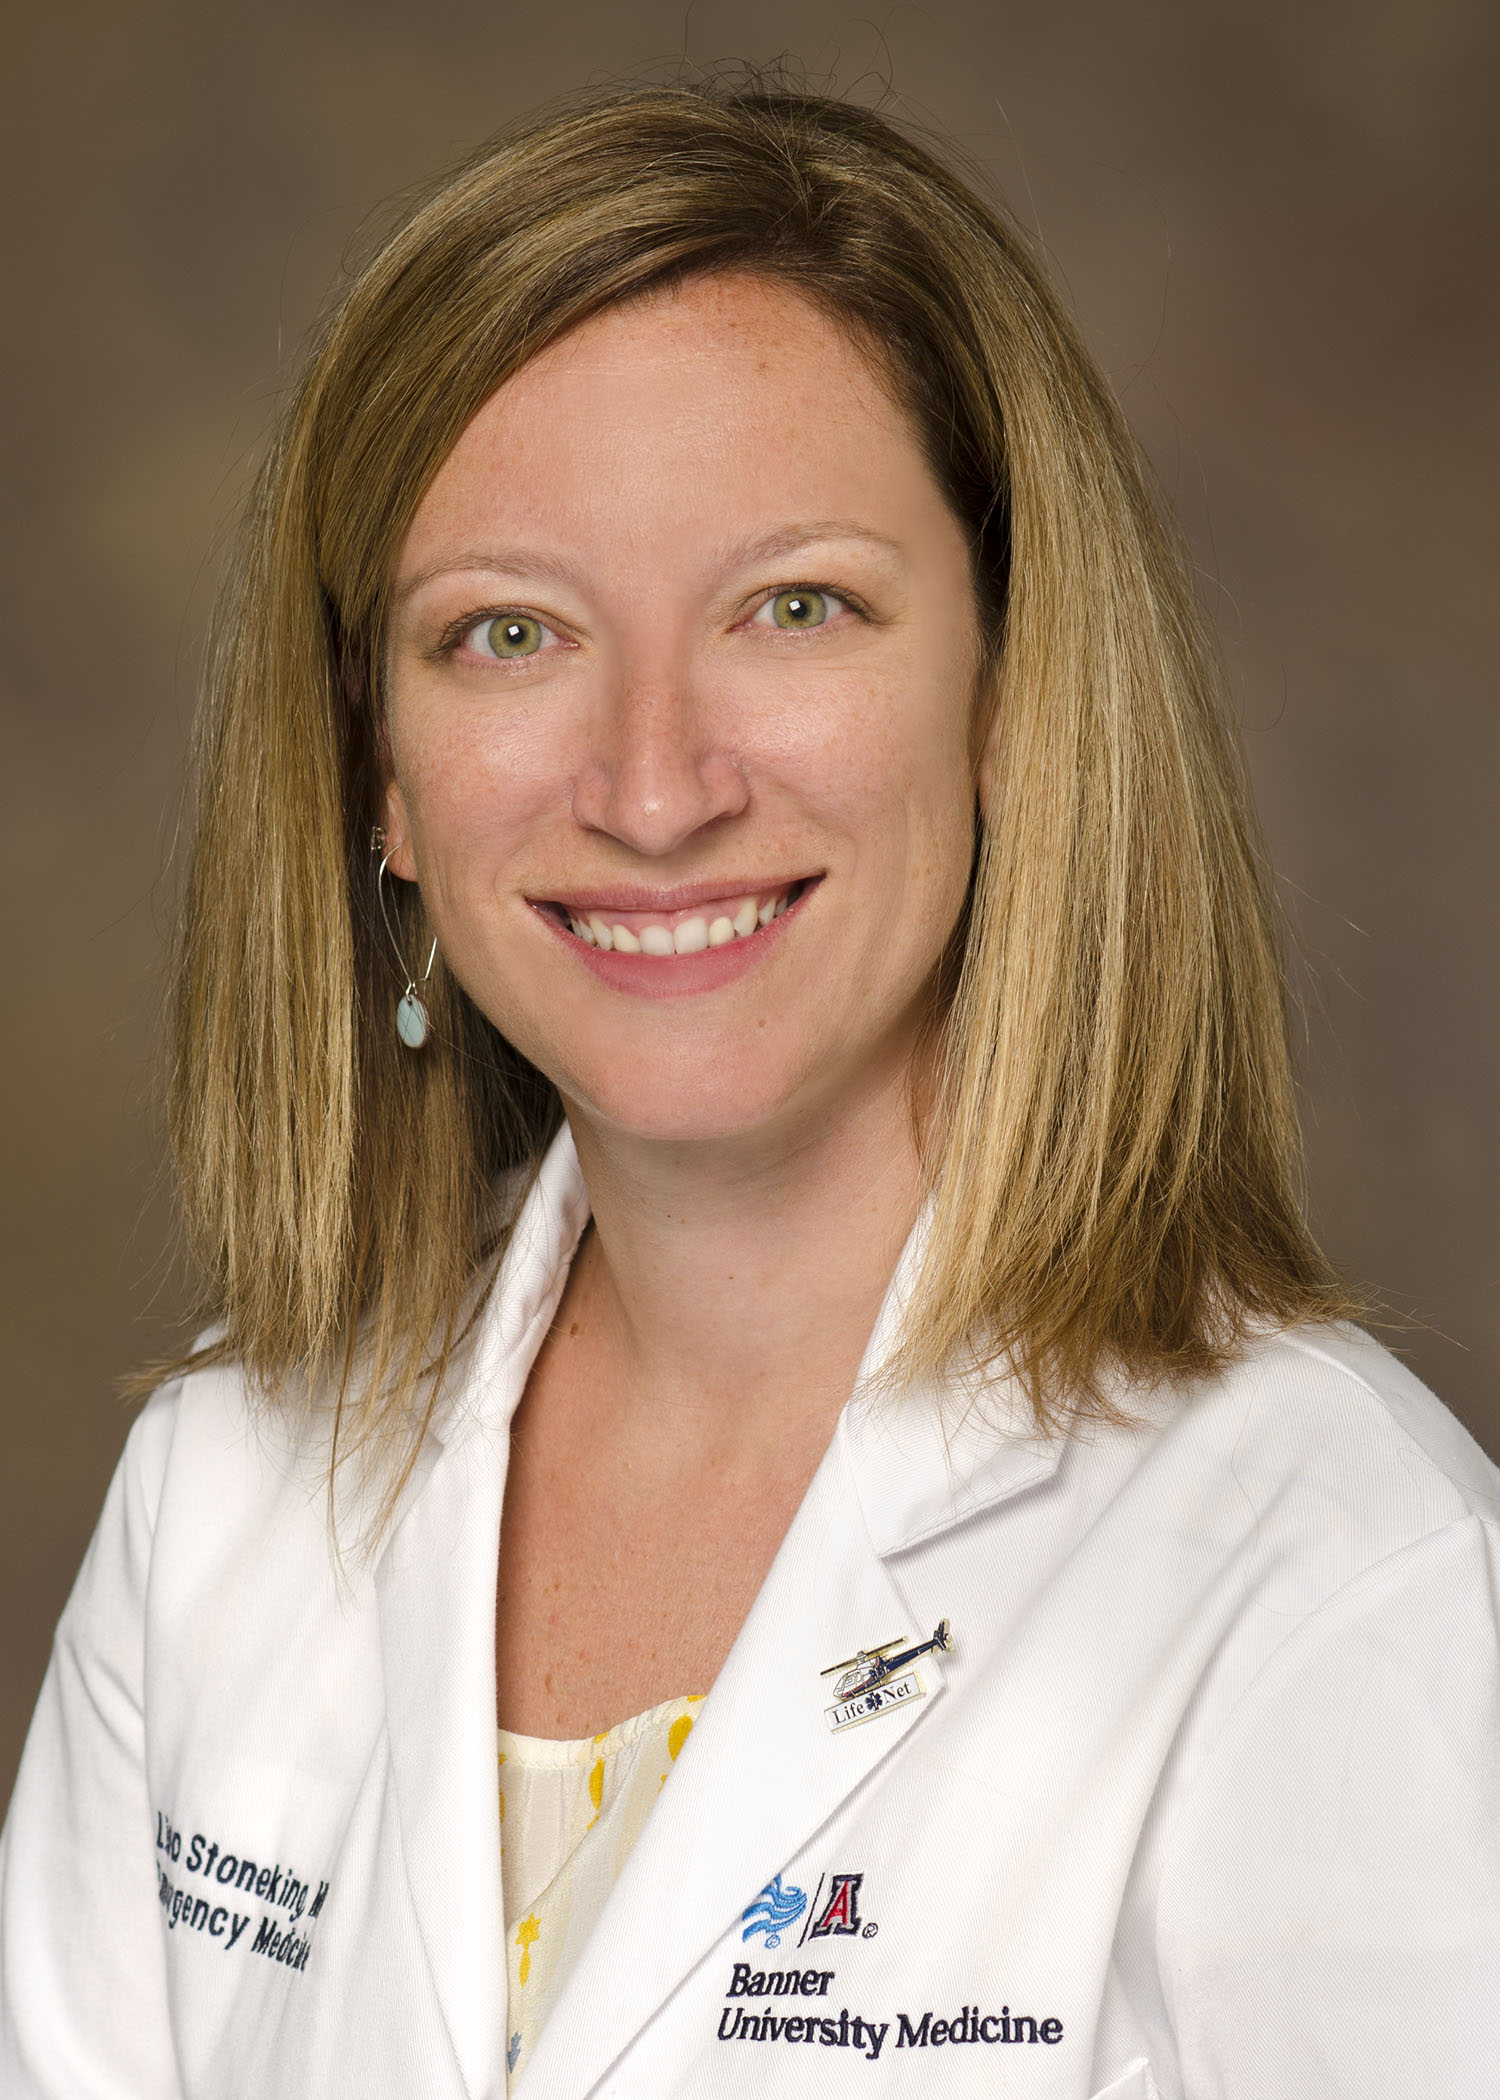 Lisa Stoneking, MD, FACEP